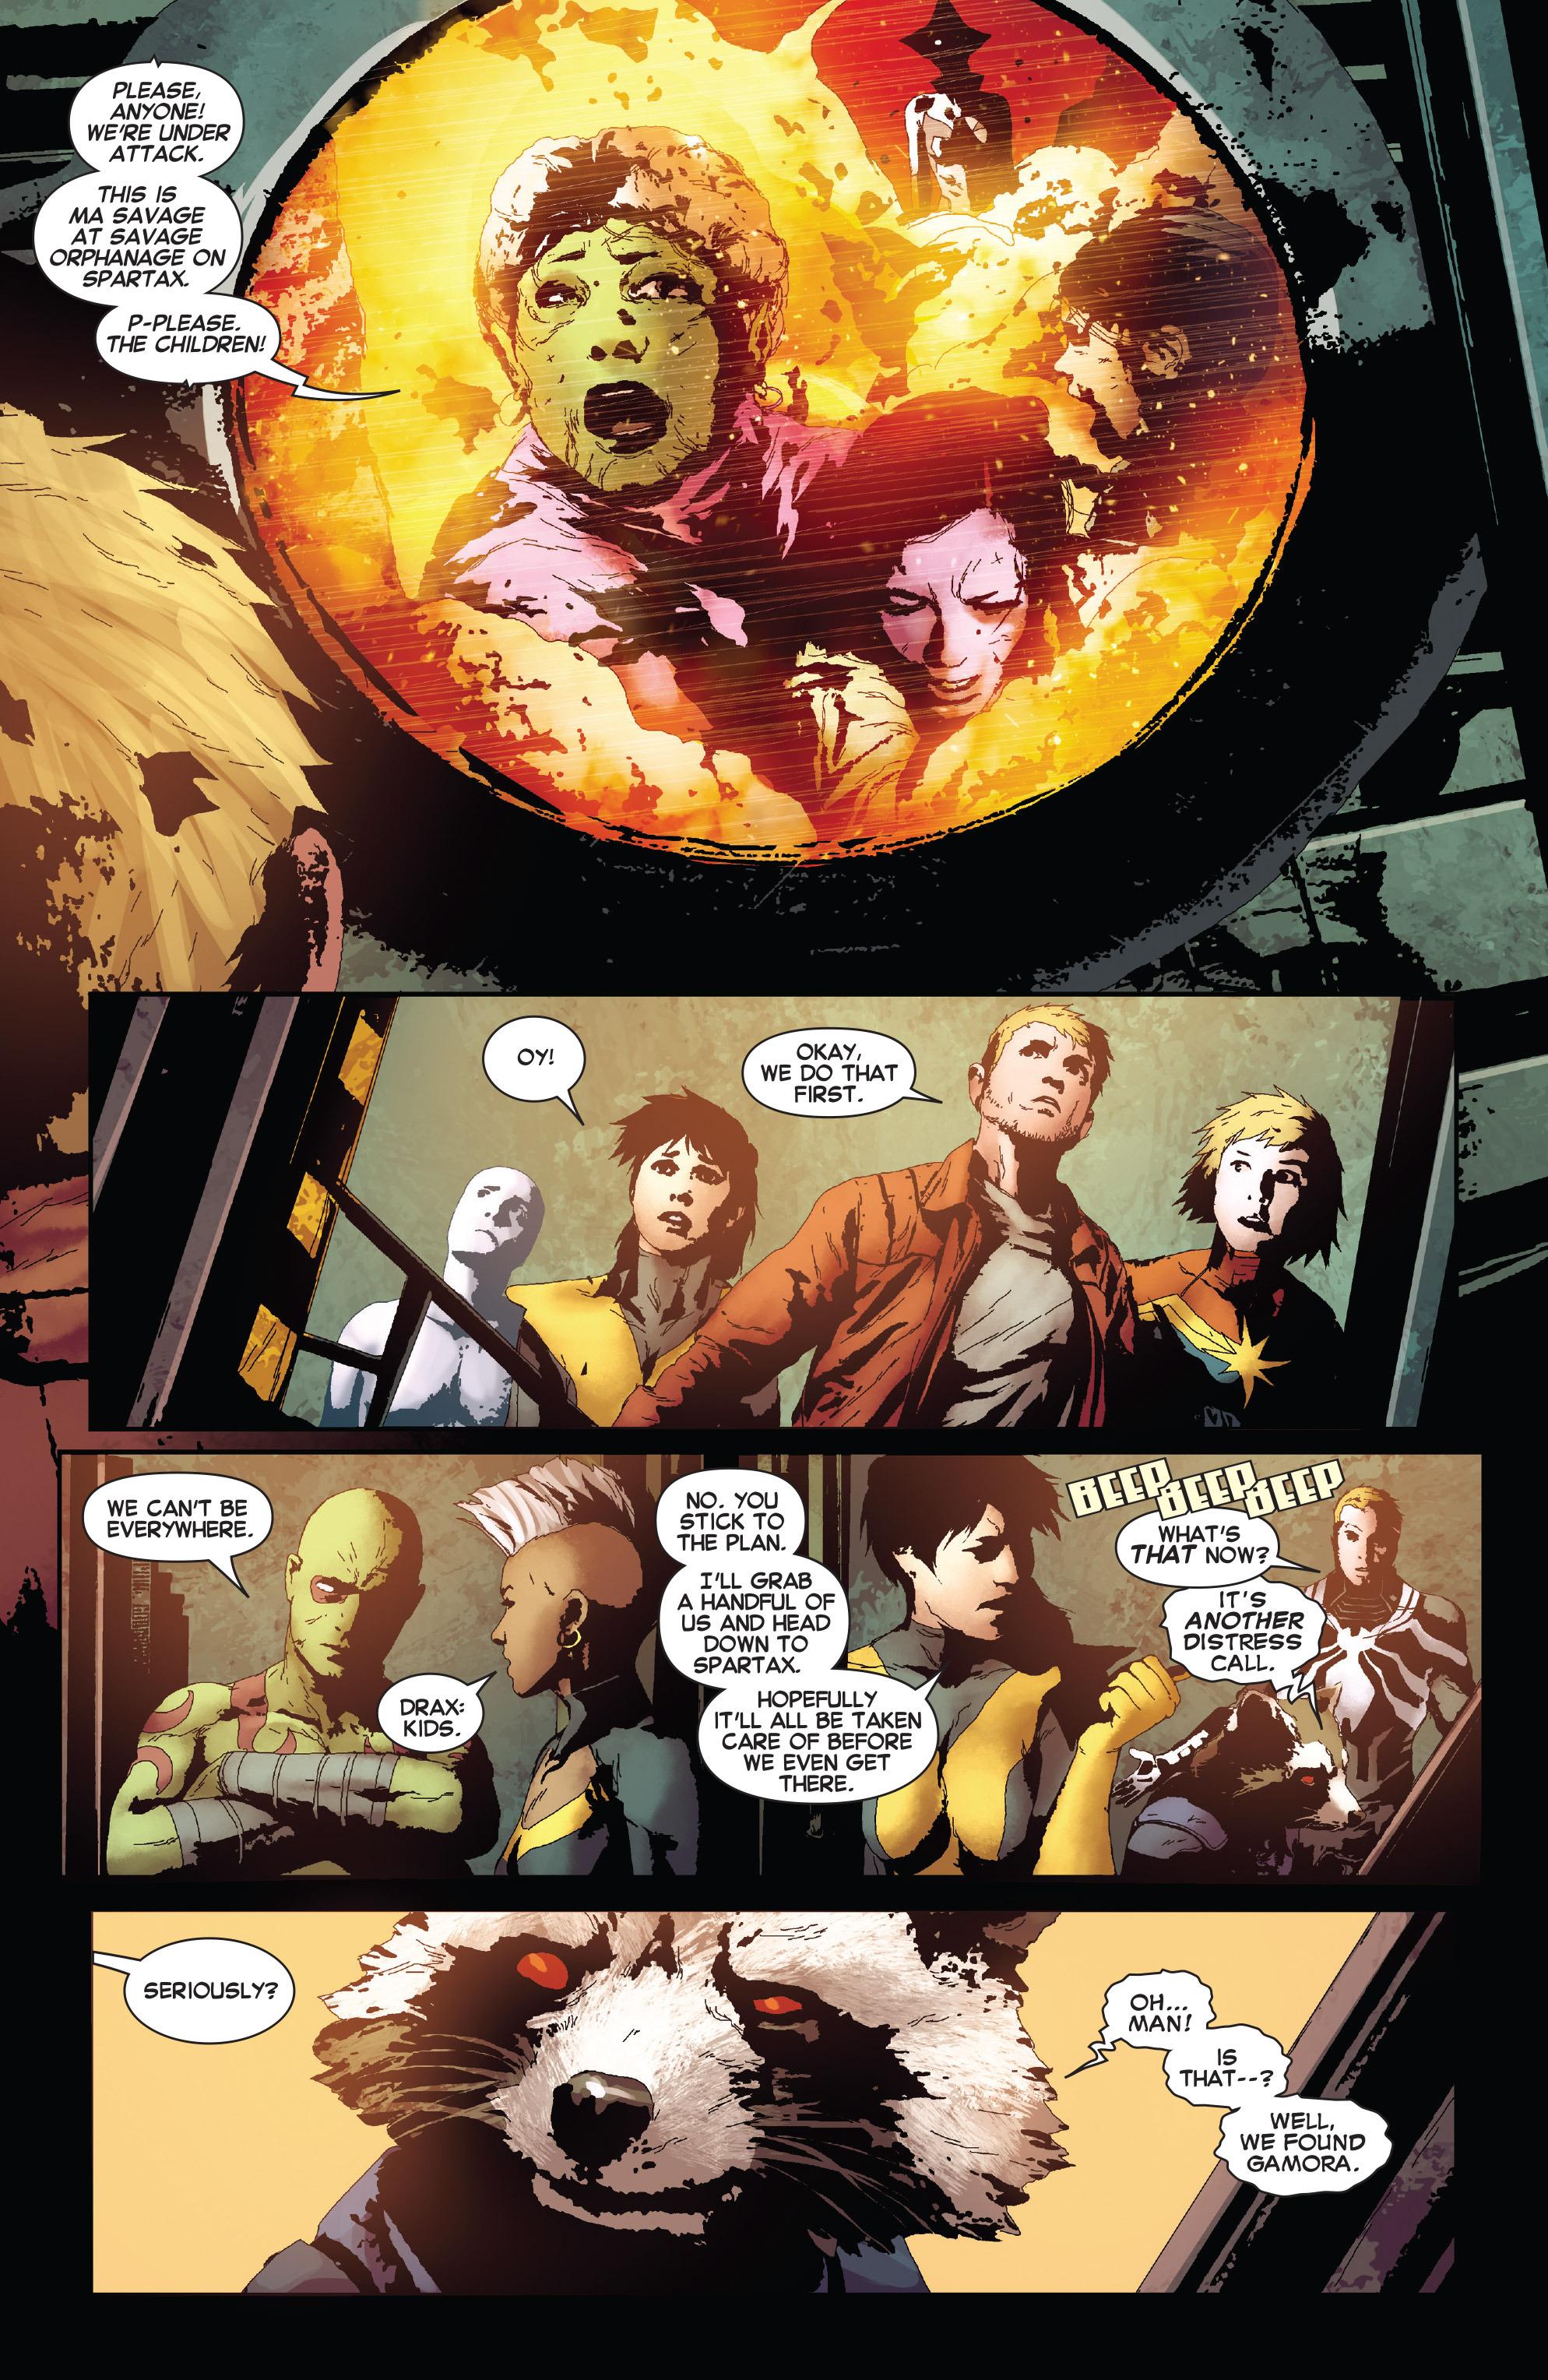 All-New X-Men (2013) chap 39 pic 13